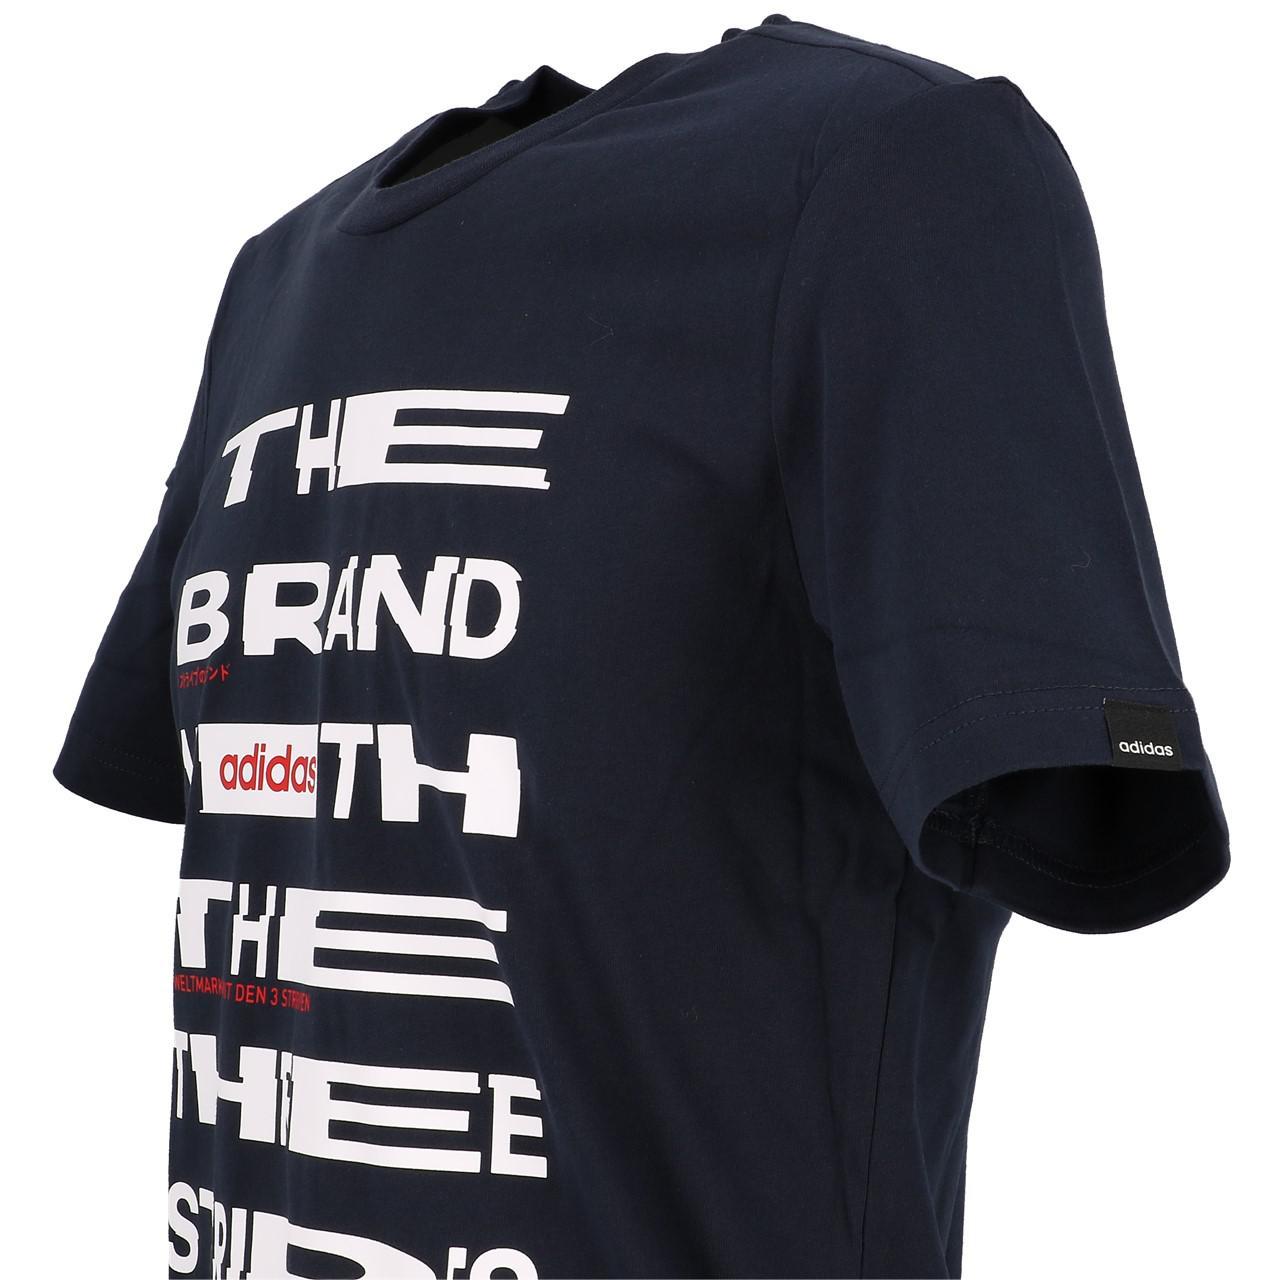 Short-Adidas-Dist-Fnt-Navy-White-Mc-Tee-Blue-29223-New thumbnail 3